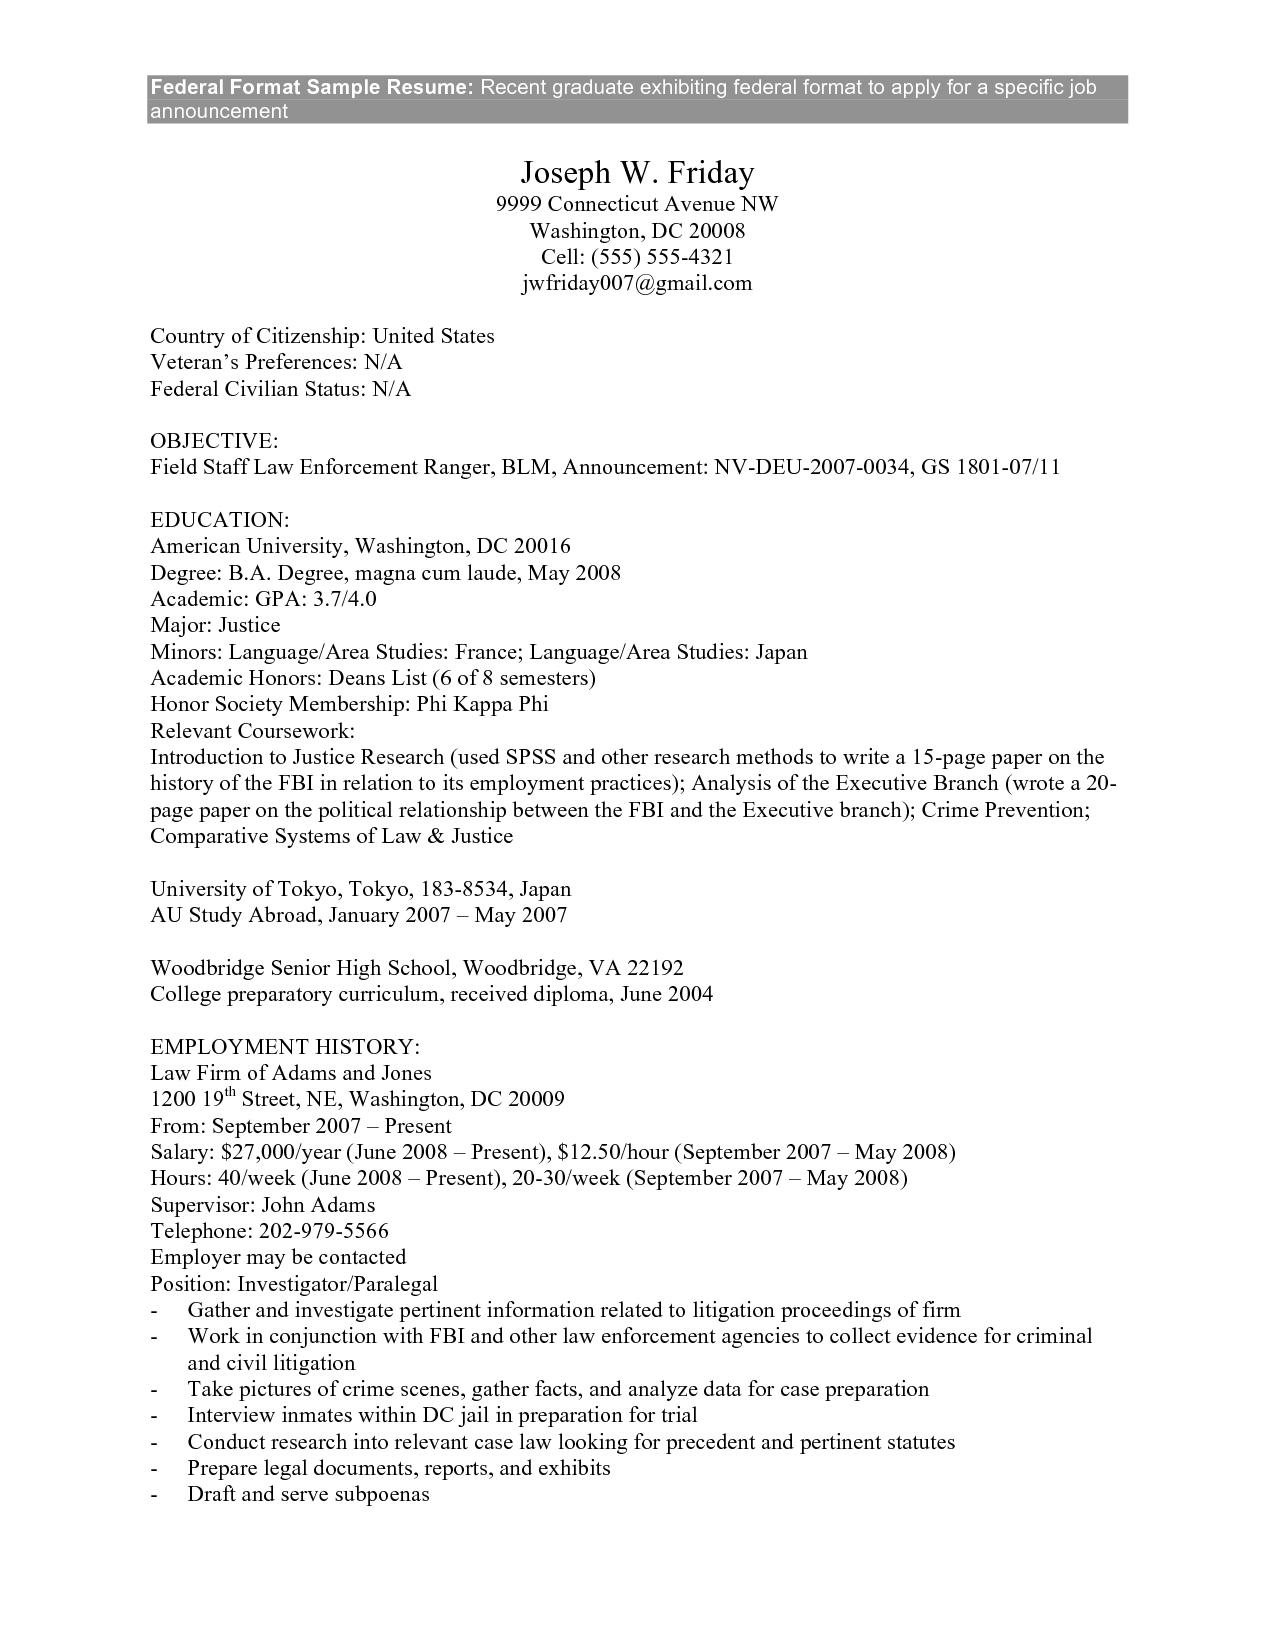 free resume templates for government jobs freeresumetemplates